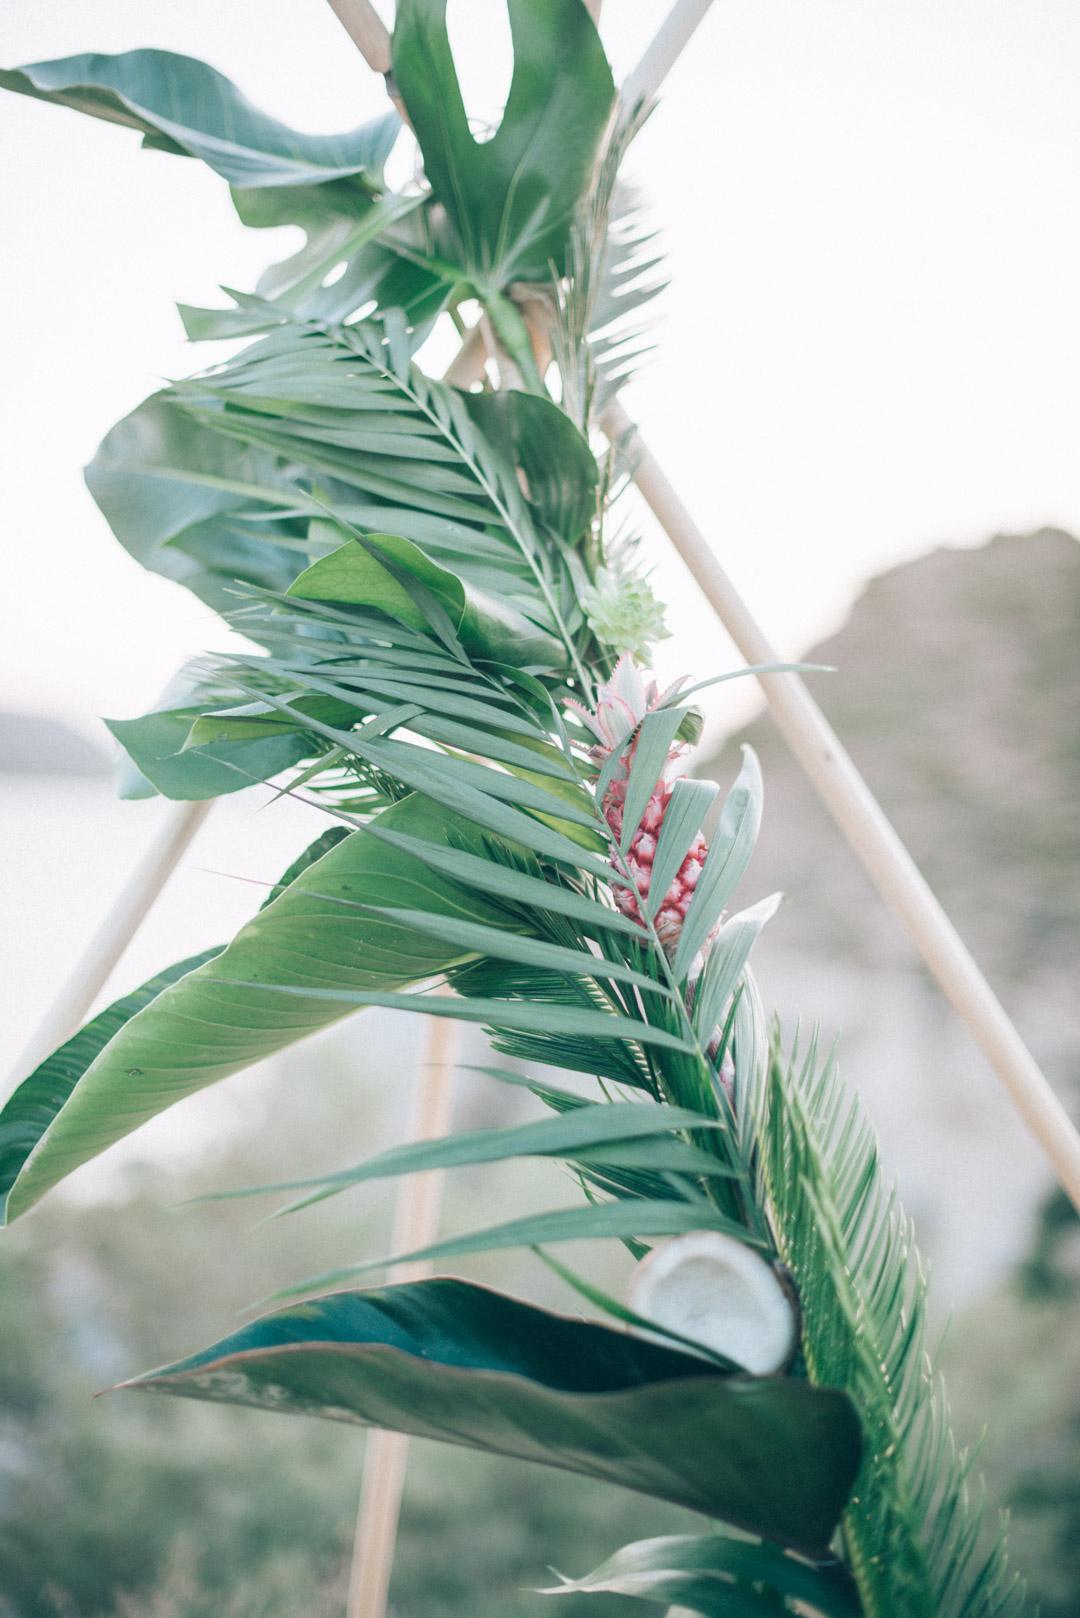 bohemian-wedding-ceremony-tipi-decor-ideas